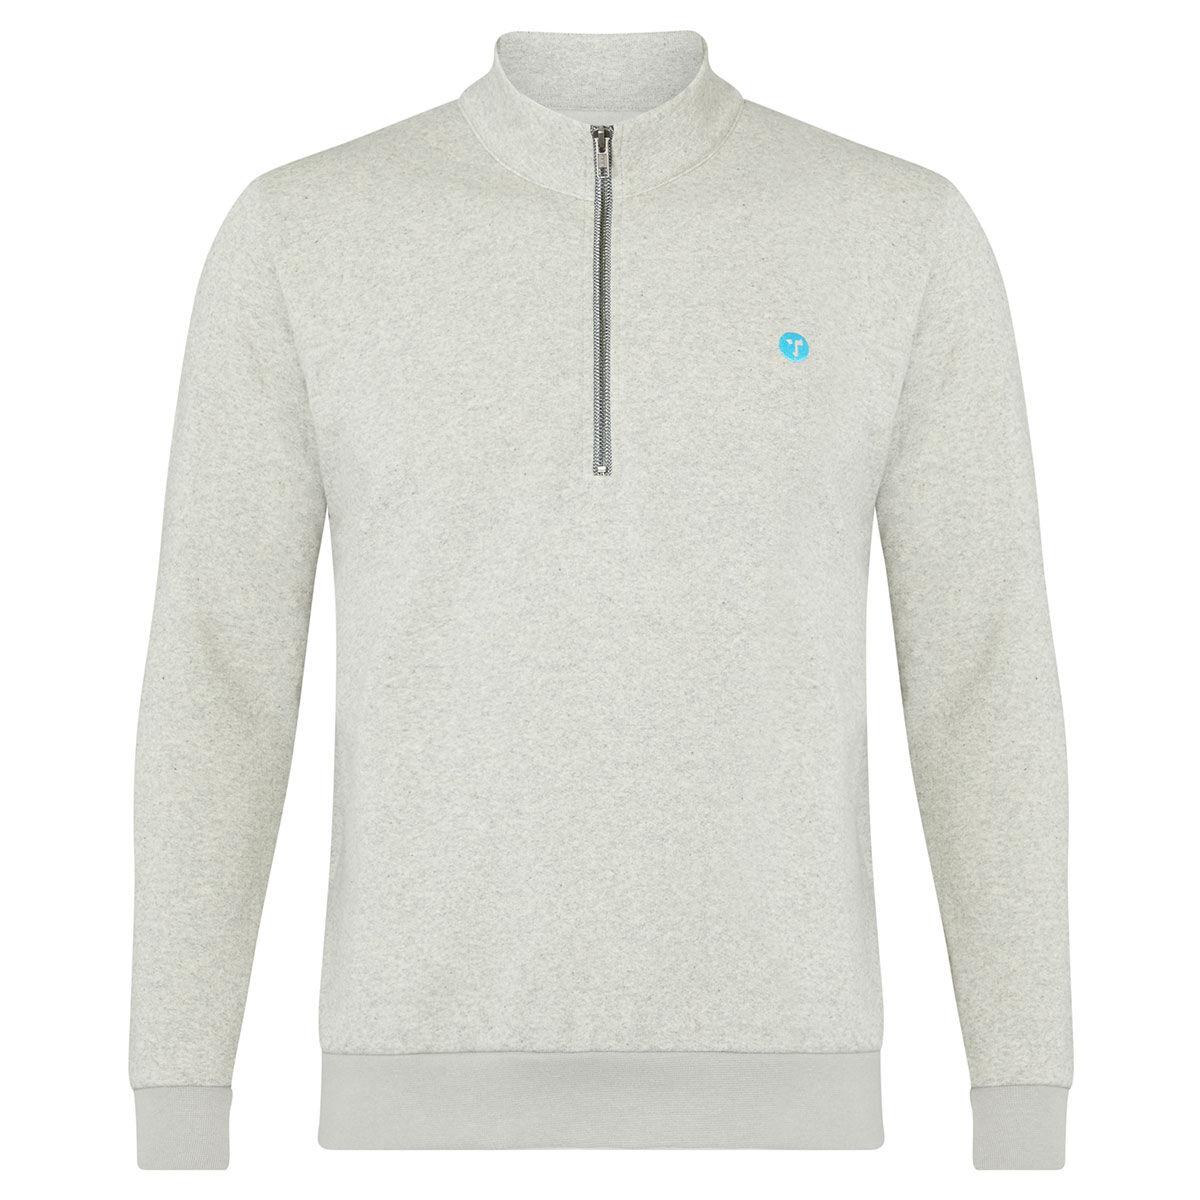 Ocean Tee Mens Grey Wobbegong Zip Golf Sweater, Size: L | American Golf